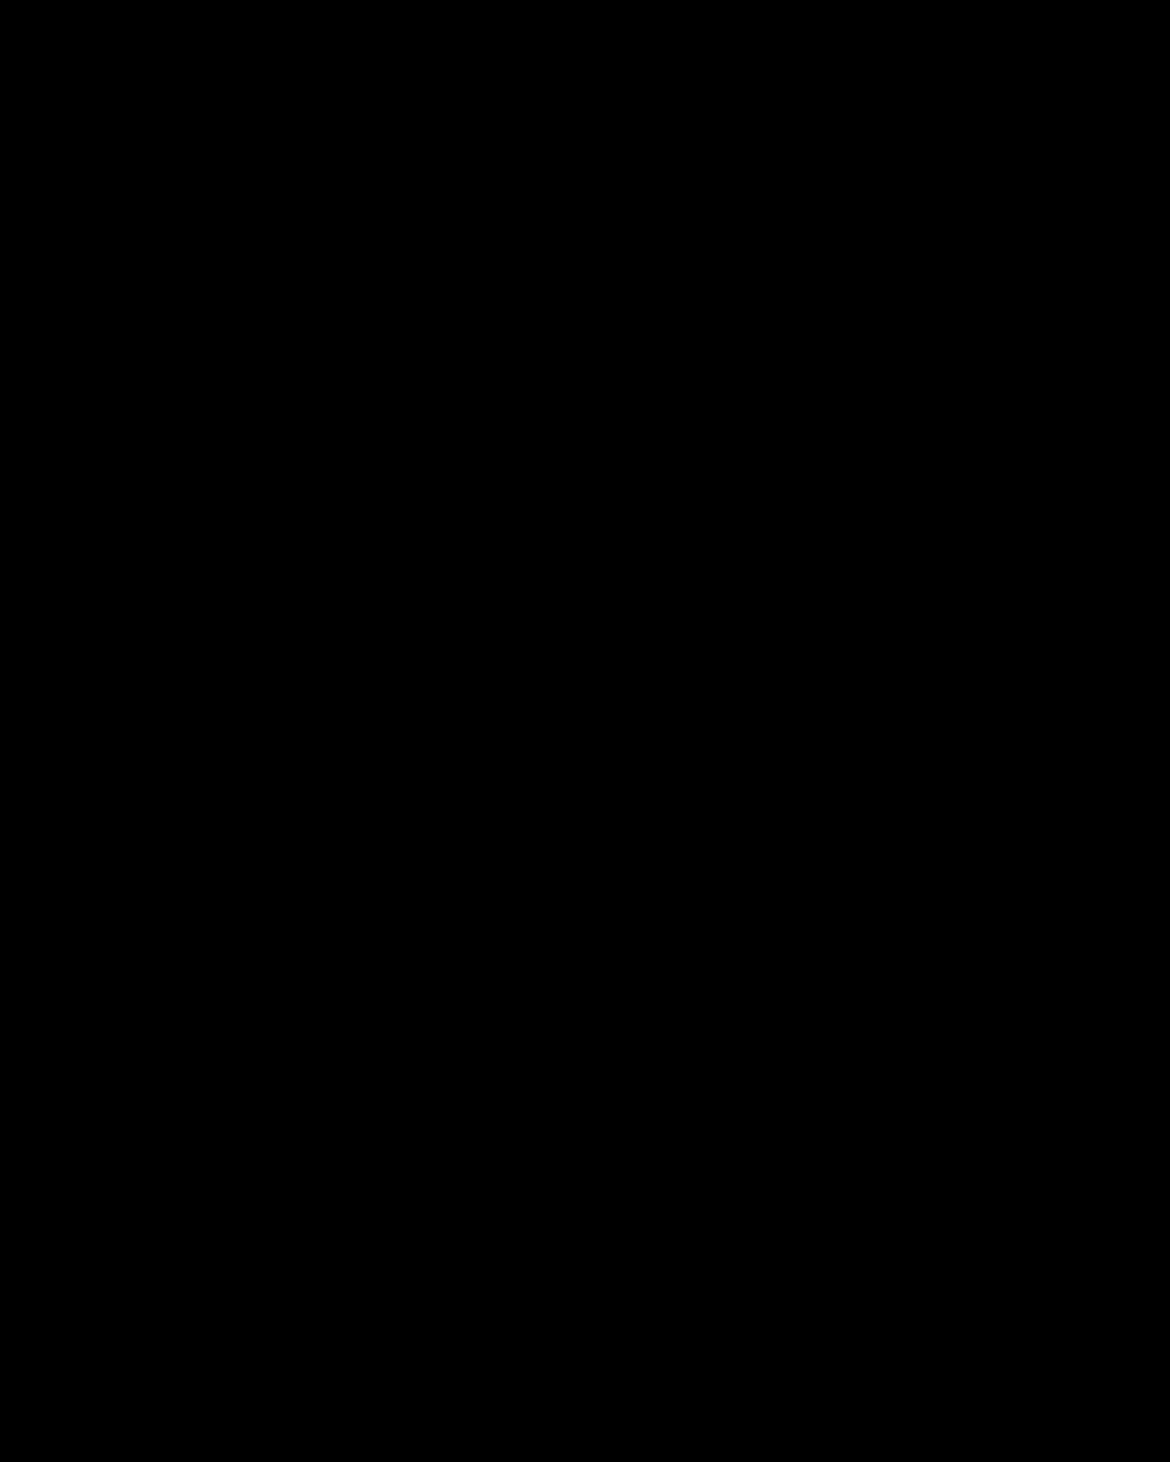 Vista su Banje beach - Croazia on the road: Da Dubrovnik a Zagreb